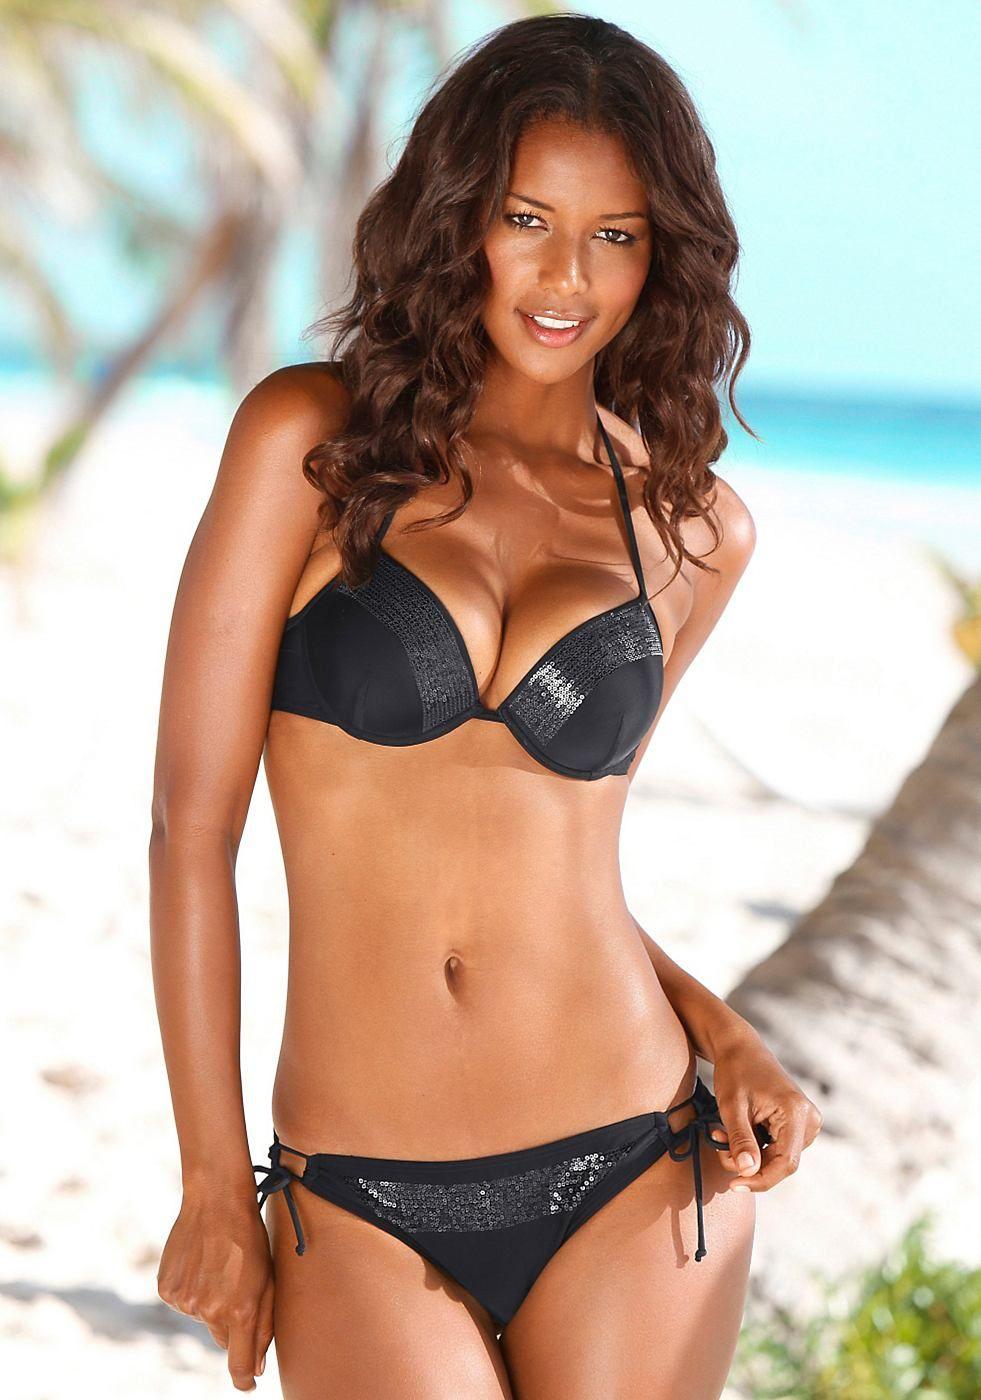 6a951c58af Push-up-Bikini, Bruno Banani | swim suit | Bikinis, Swimwear, Push ...